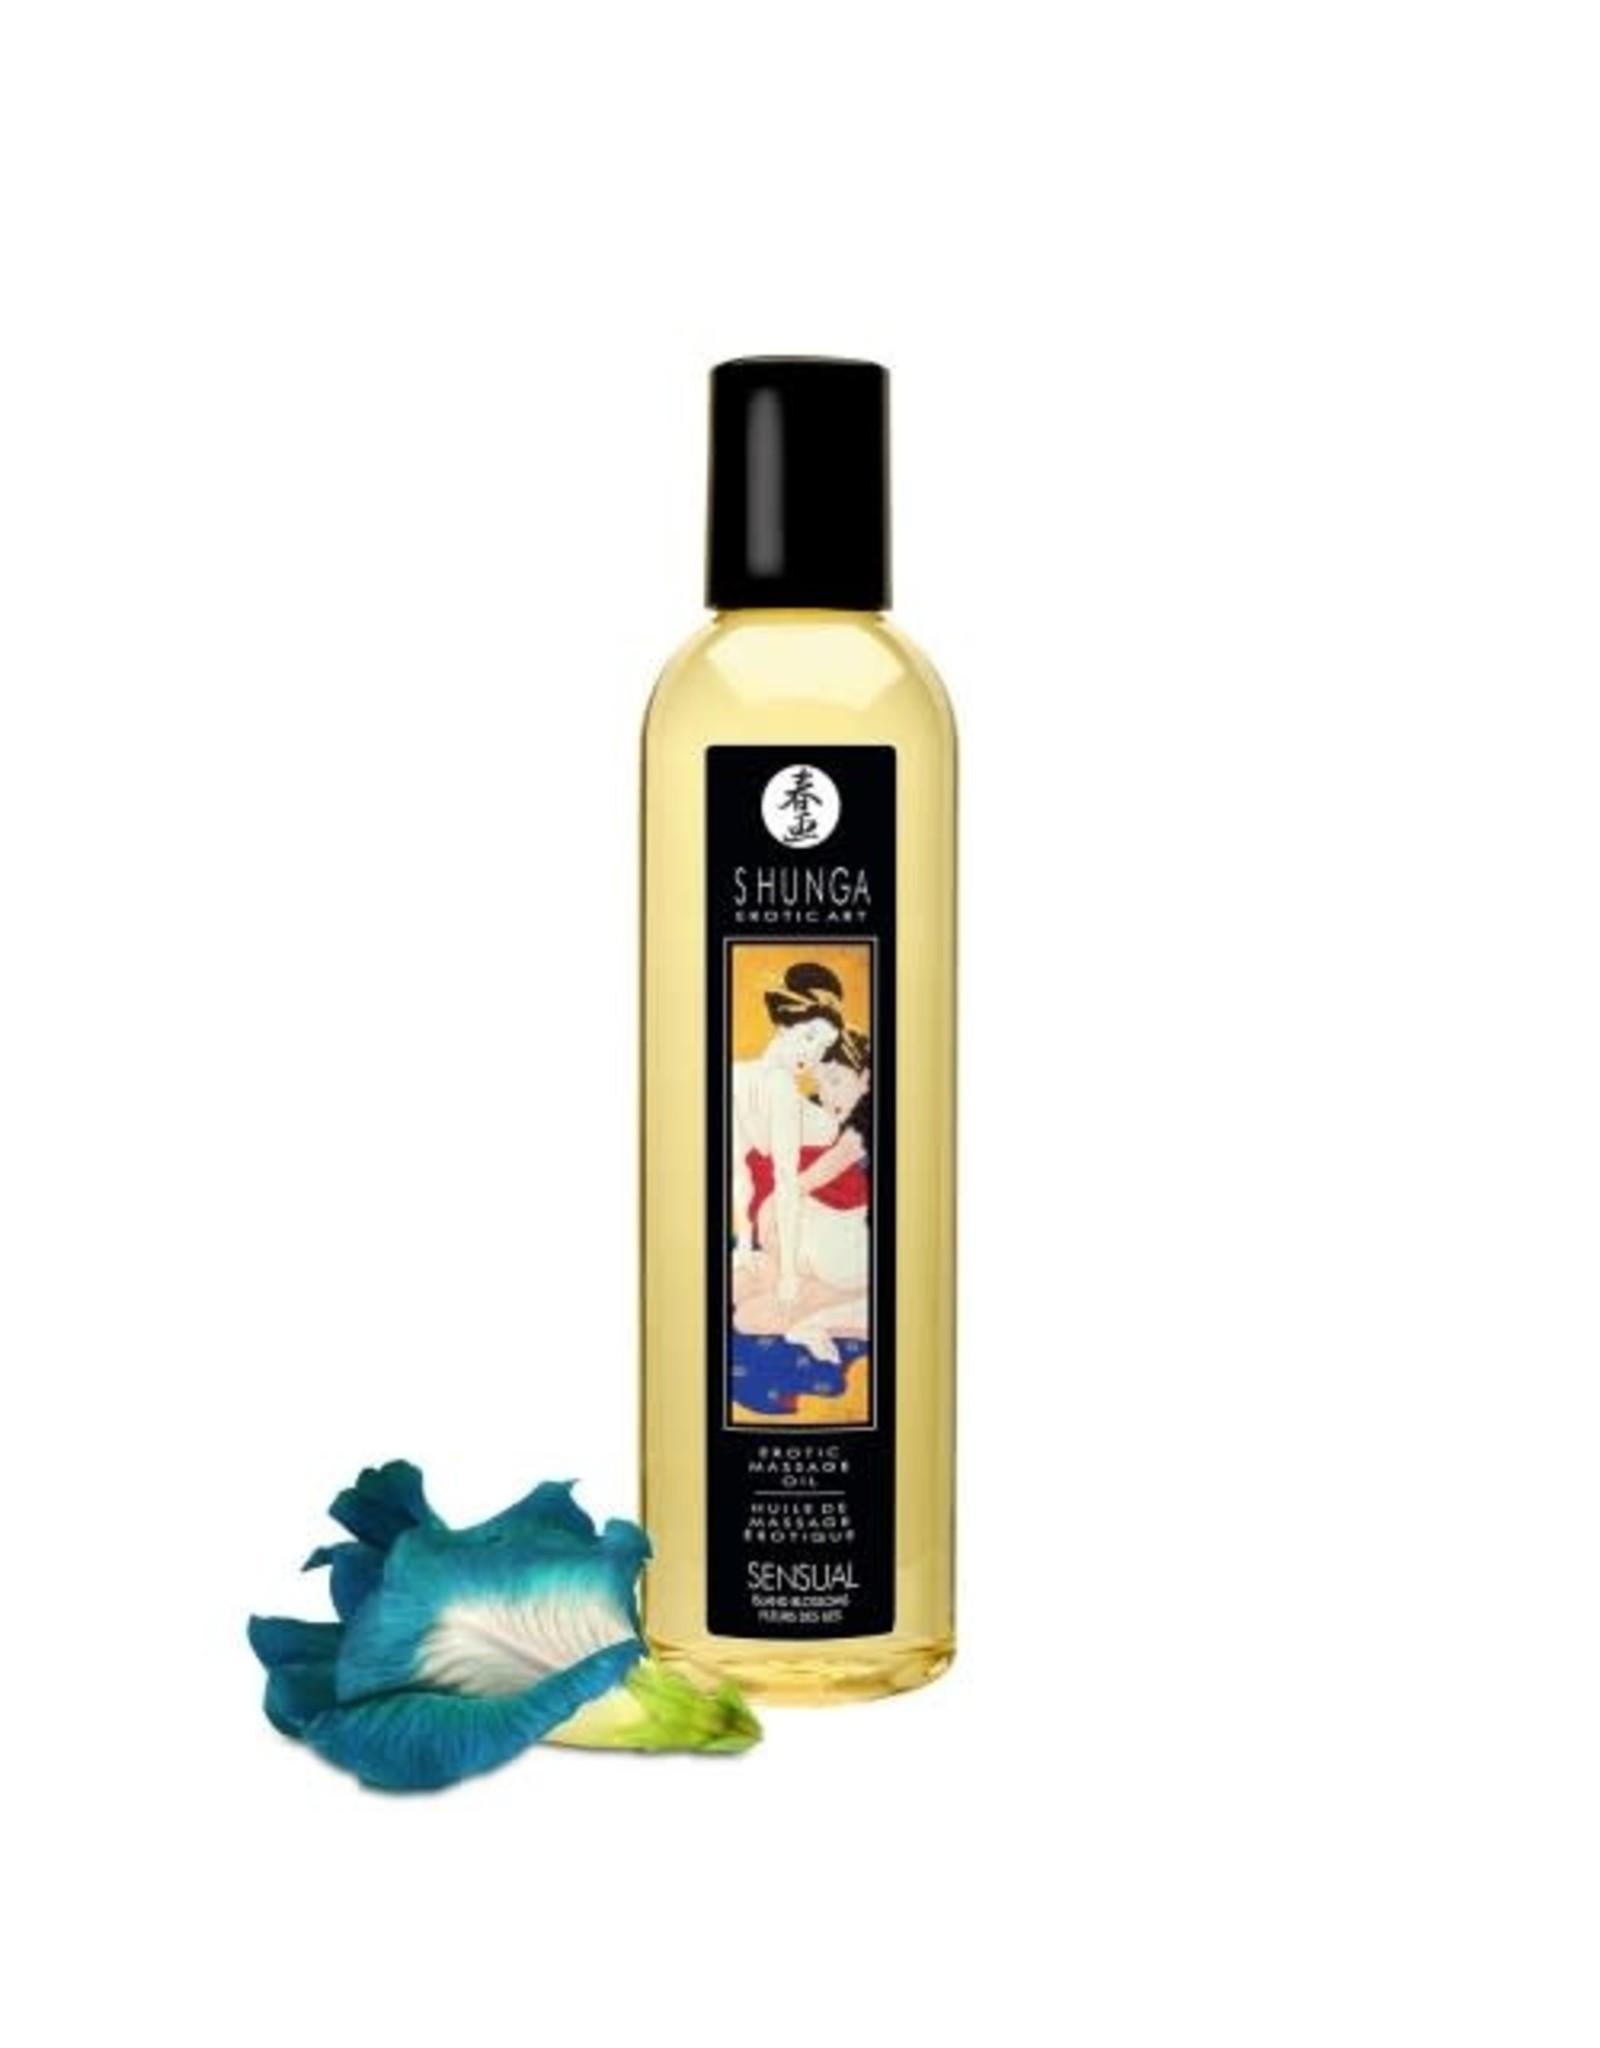 Shunga Shunga - Erotic Massage Oil - Sensual - Island Blossom